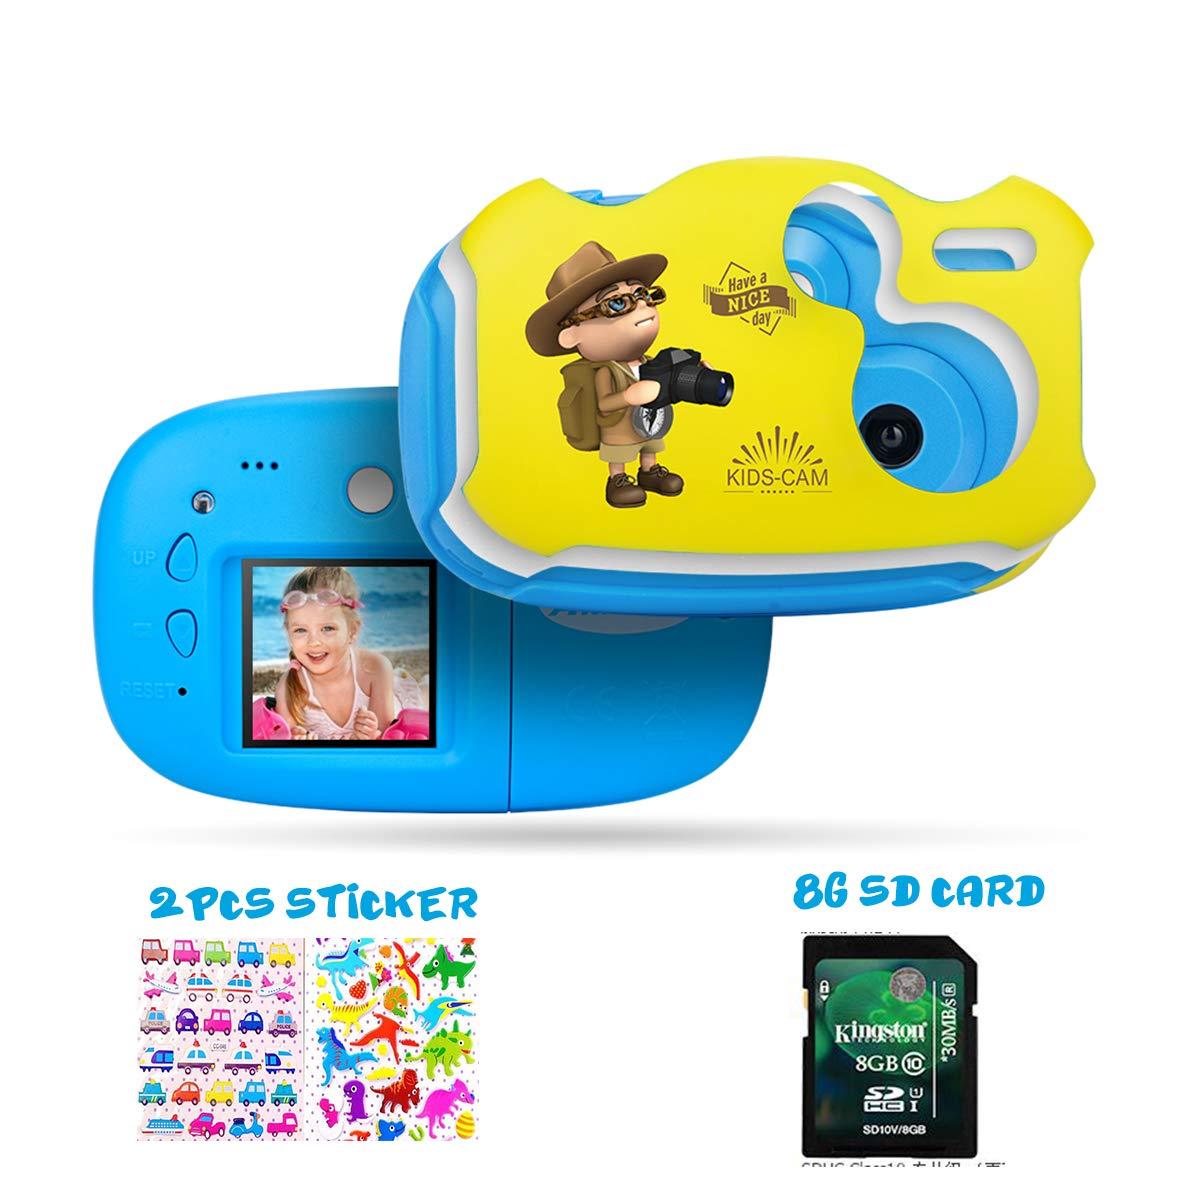 Amkov Kids Camera Cute DIY Digital Camera for Kids 1.44 inch IPS Mini Video Camera with Cartoon Sticker Gift for Children Boys Girls Blue